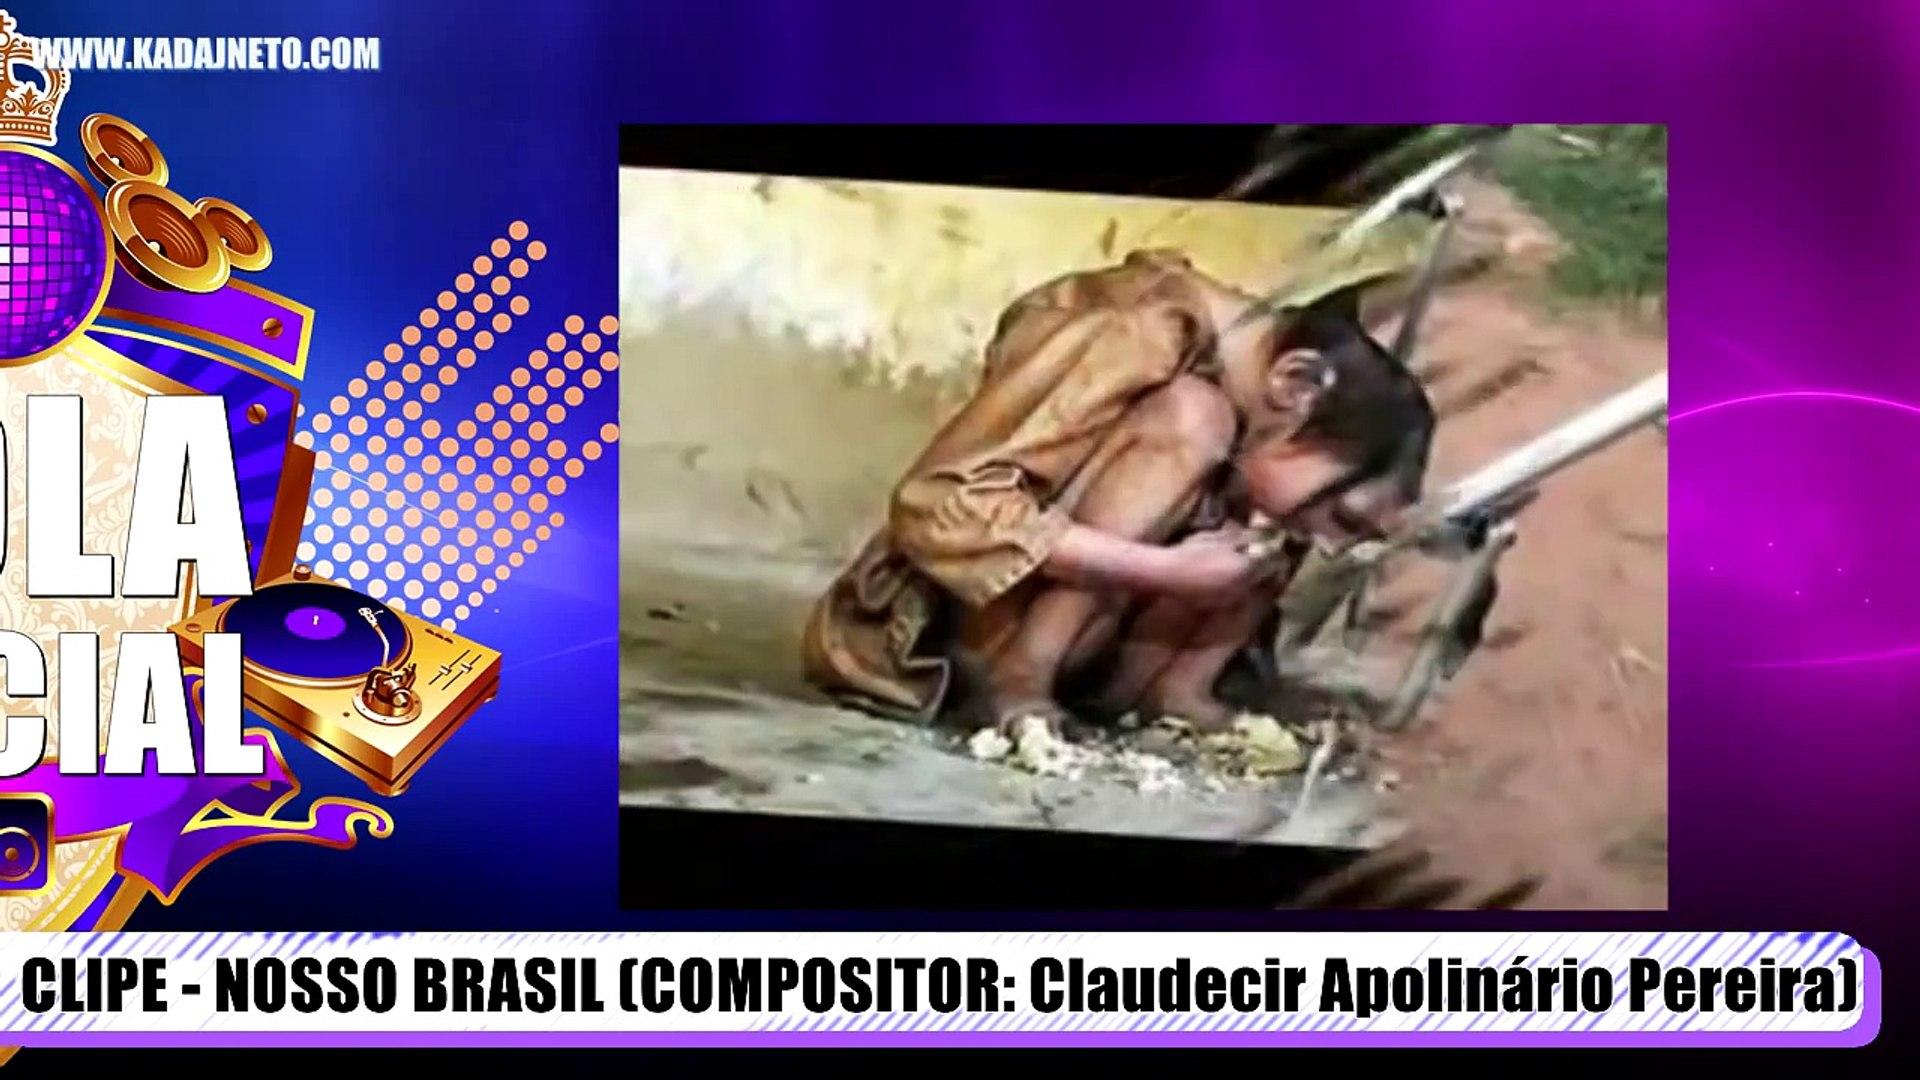 Clipe: Nosso Brasil (Compositor Bola)